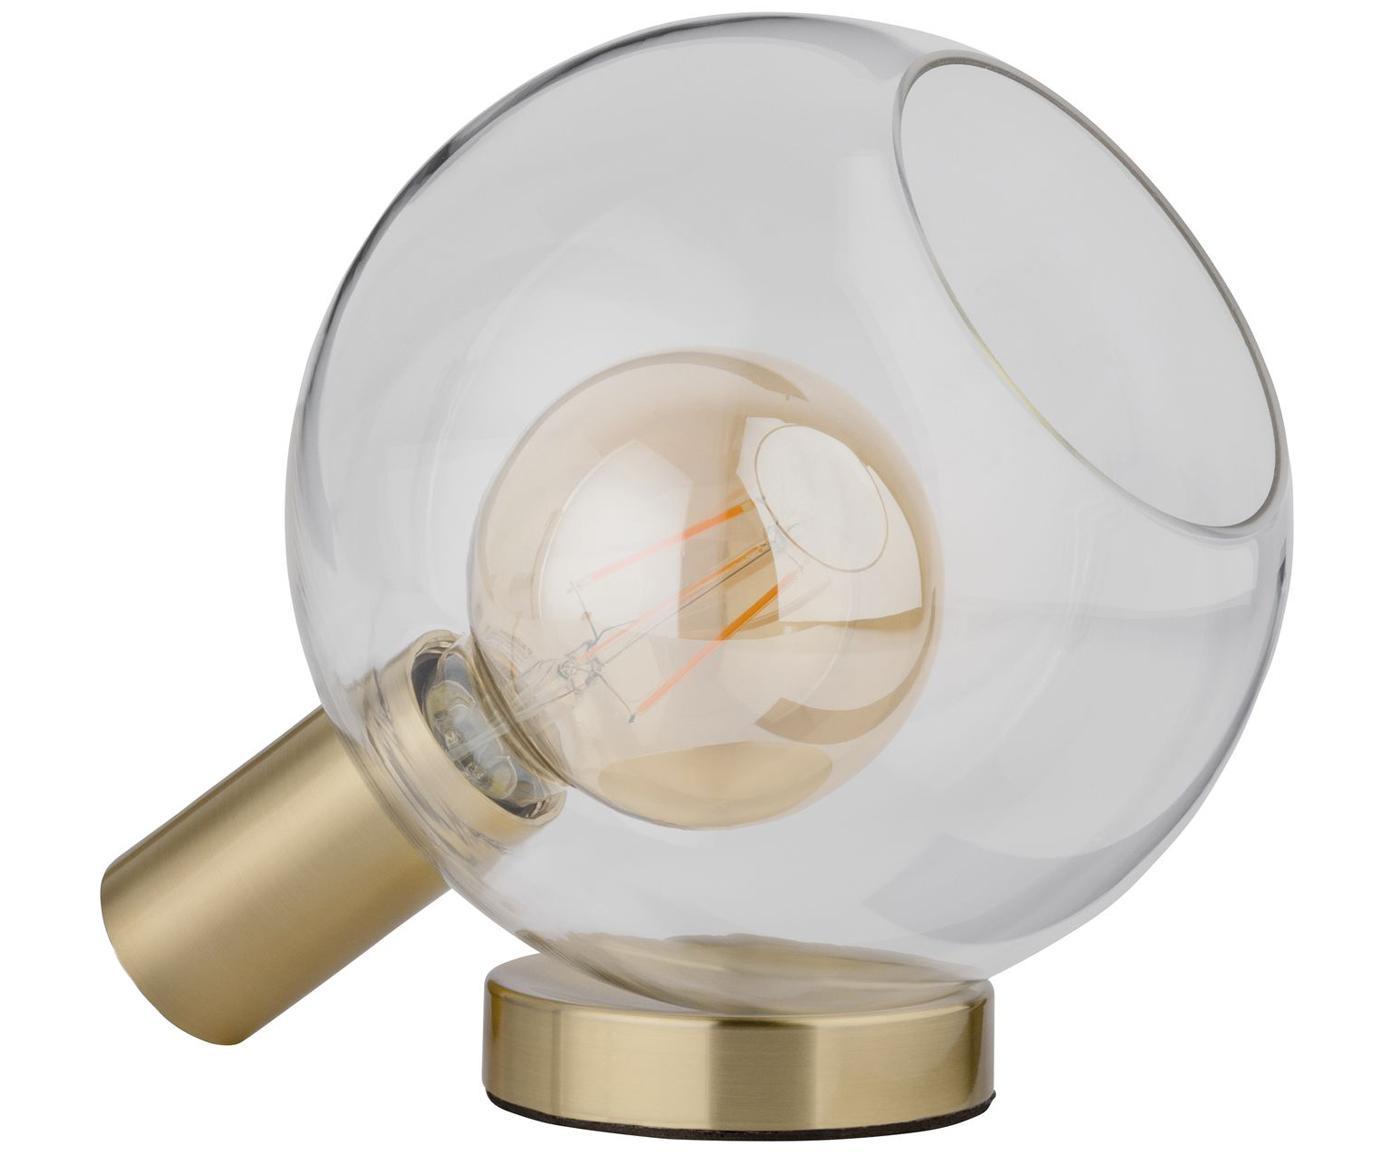 Tafellamp Esben van glas, Lampenkap: glas, Lampvoet: geborsteld messing, Messingkleurig, transparant, 25 x 22 cm